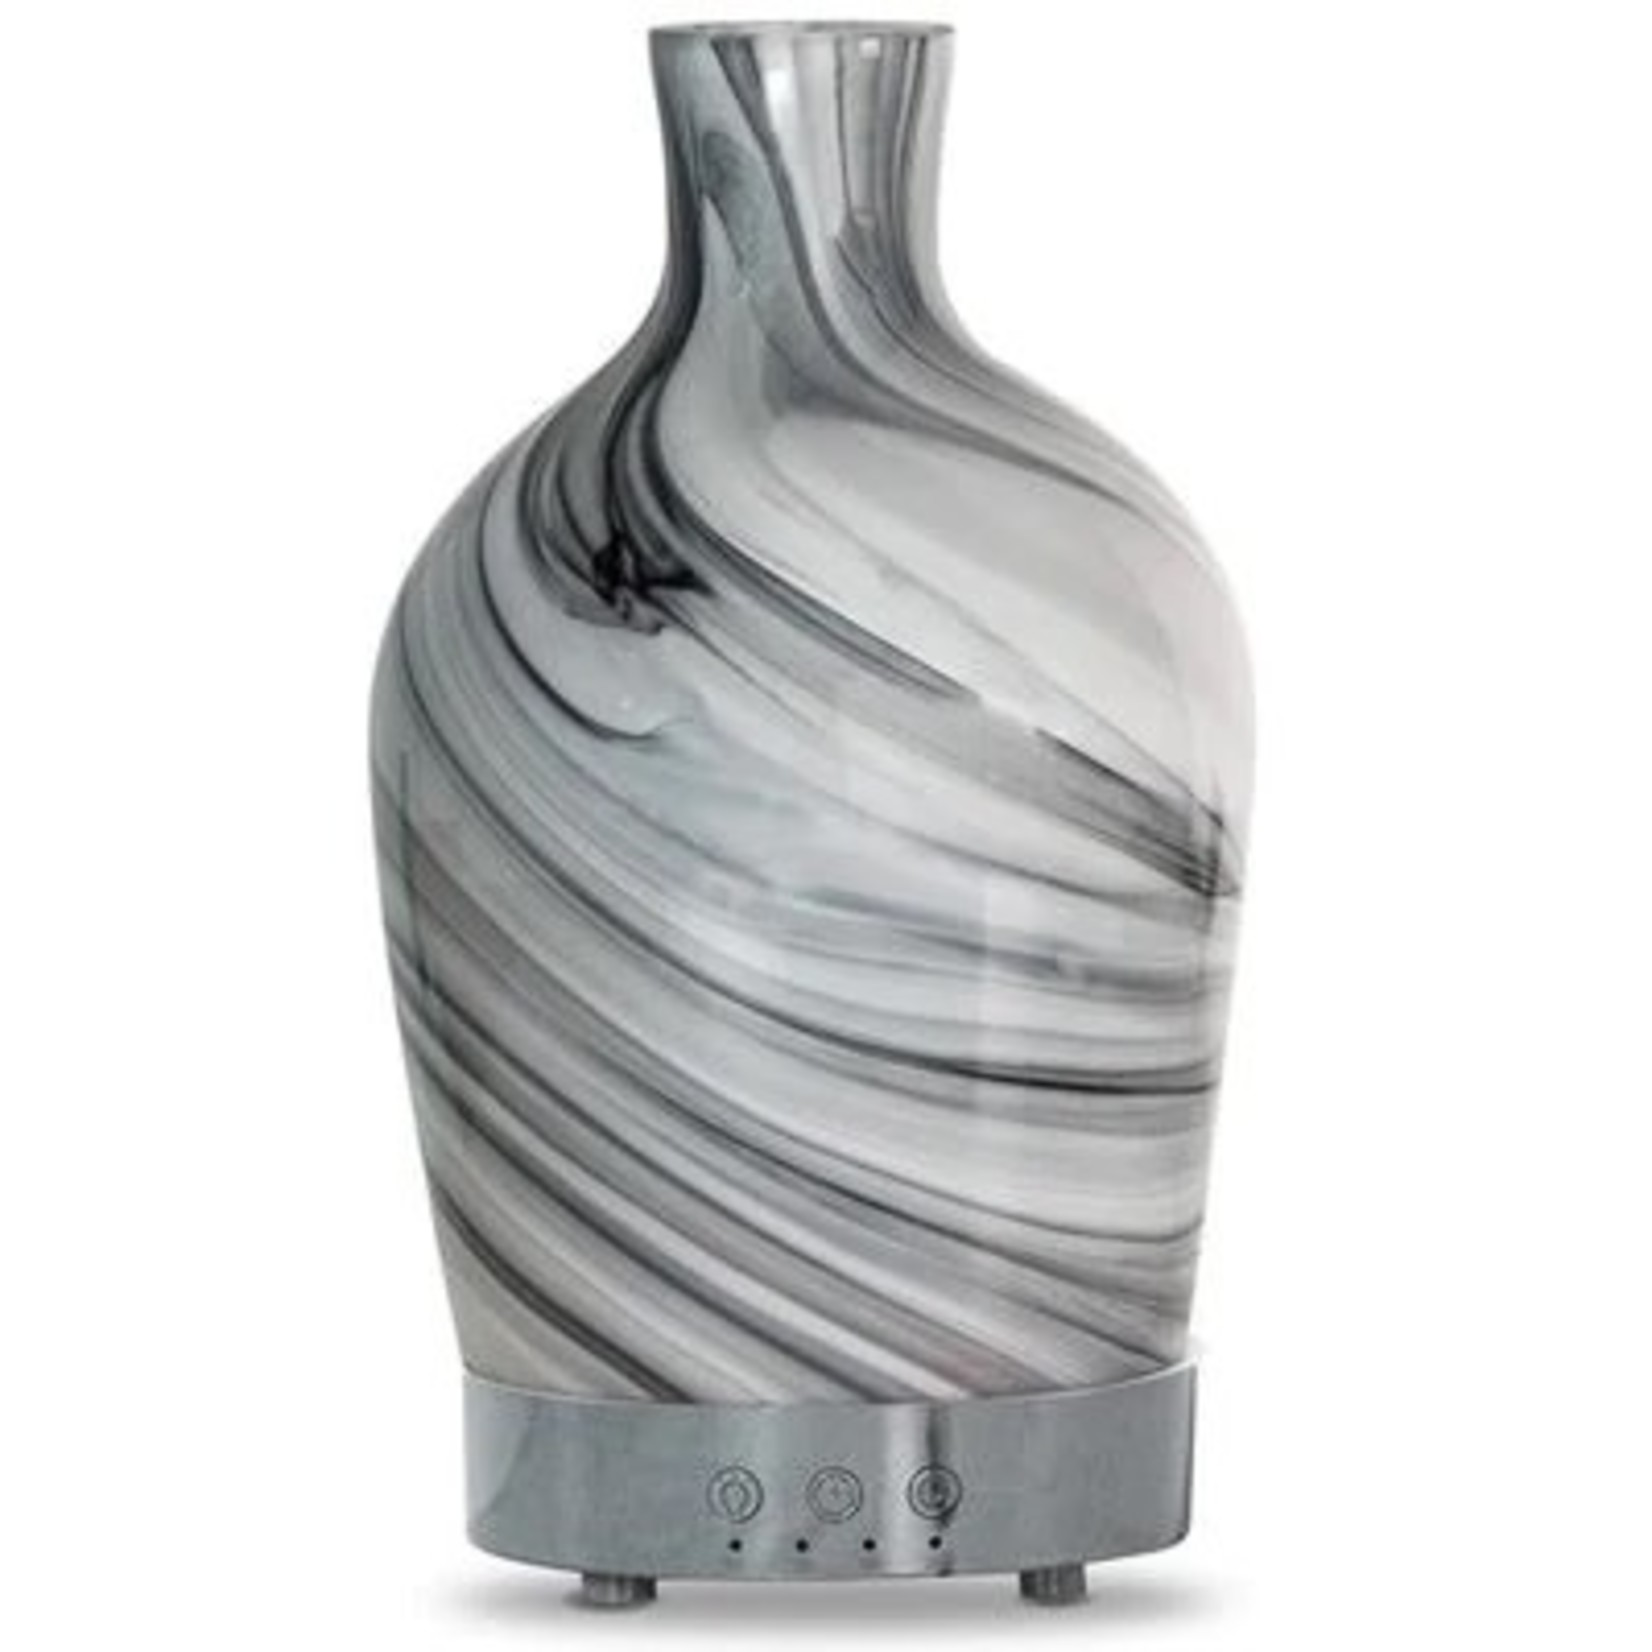 Serene Living Carrara Marble Ultrasonic Diffuser